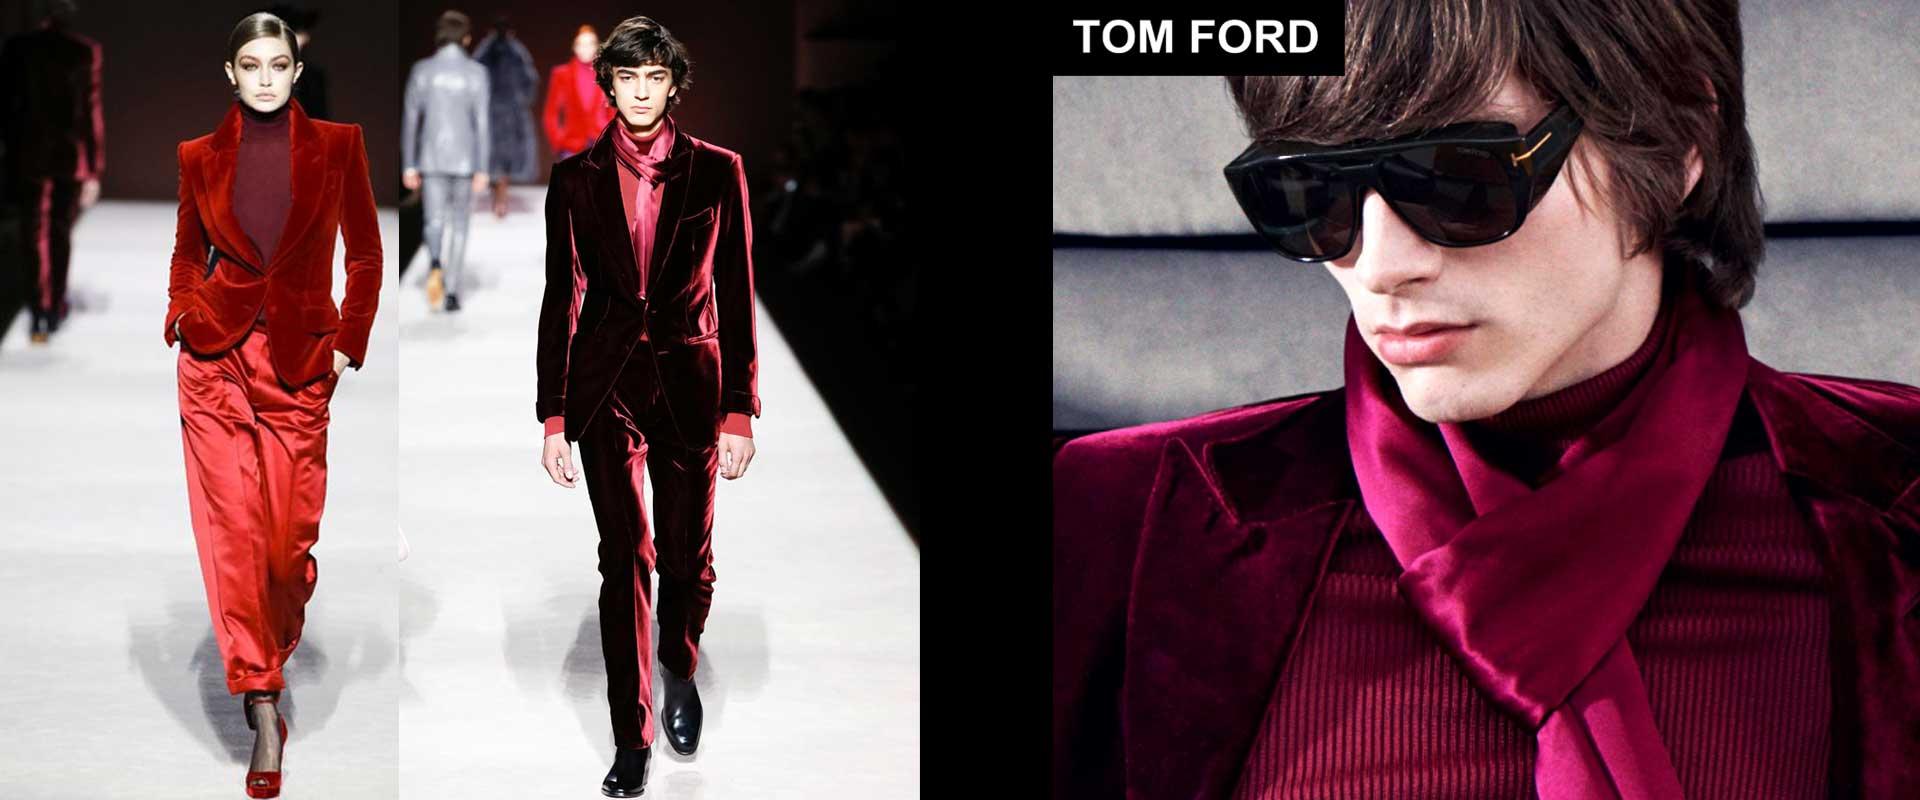 TomFord 2 9 1 - تام فورد Tom Ford